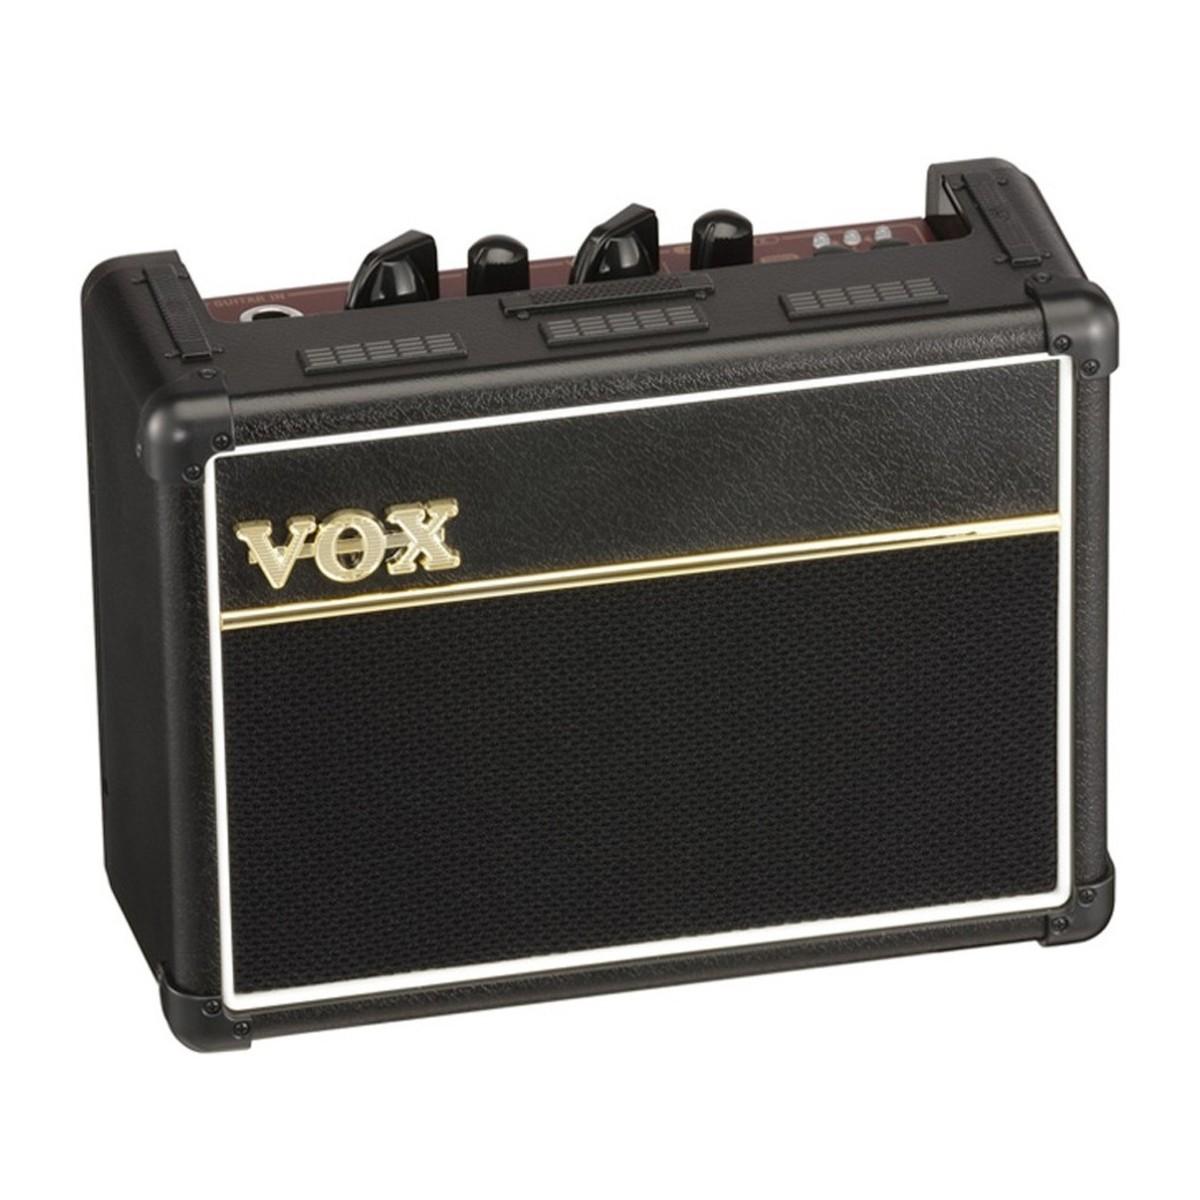 Vox Ac2 Rhythmvox Mini Guitar Amp At Gear4music Circuit Amplifiers